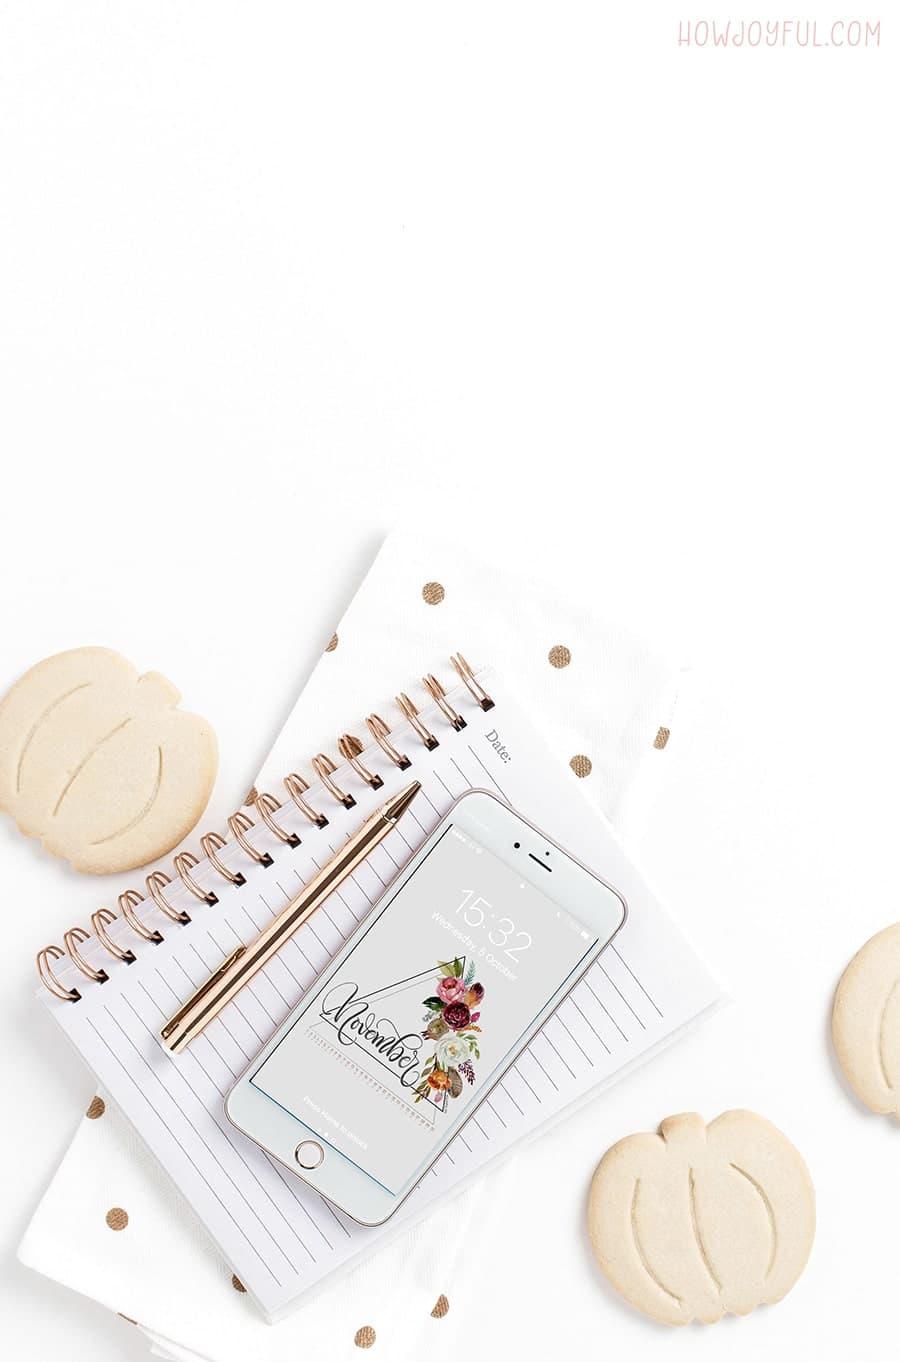 FREE November tech calendar print and wallpaper - Hand lettered watercolor calendar